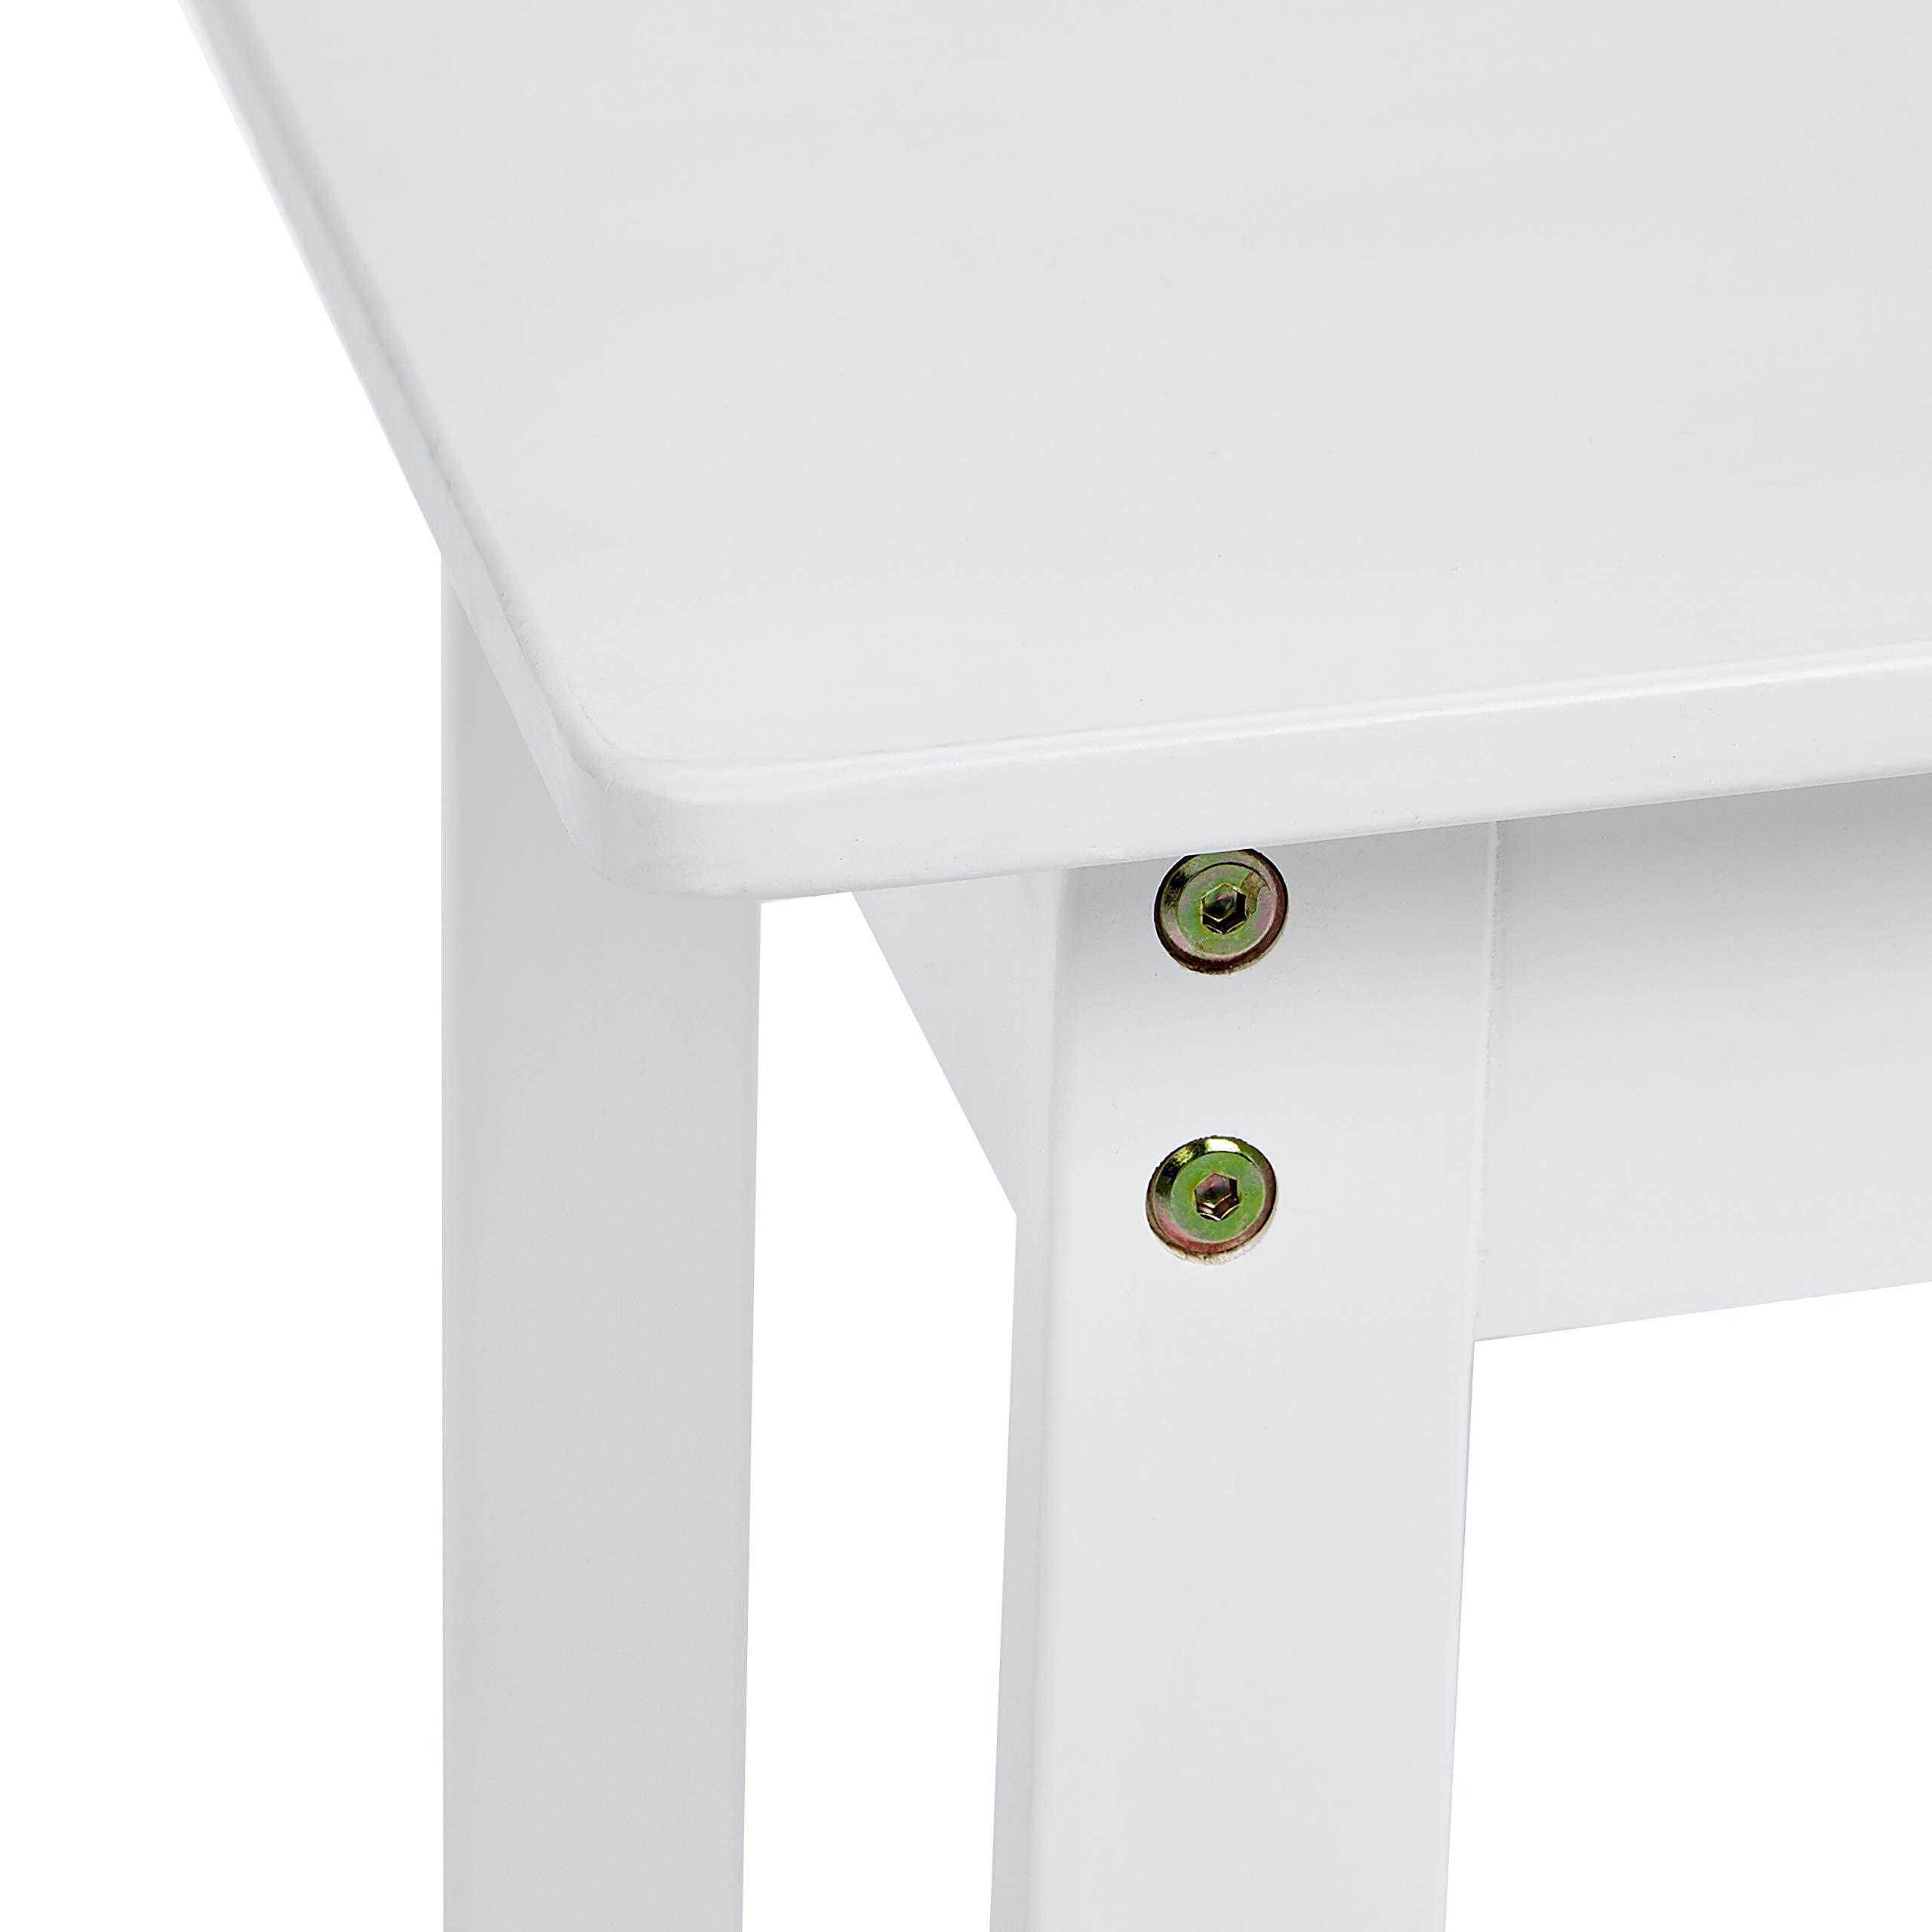 AmazonBasics Kids Solid Wood Table and 2 Chair Set, White by AmazonBasics (Image #6)